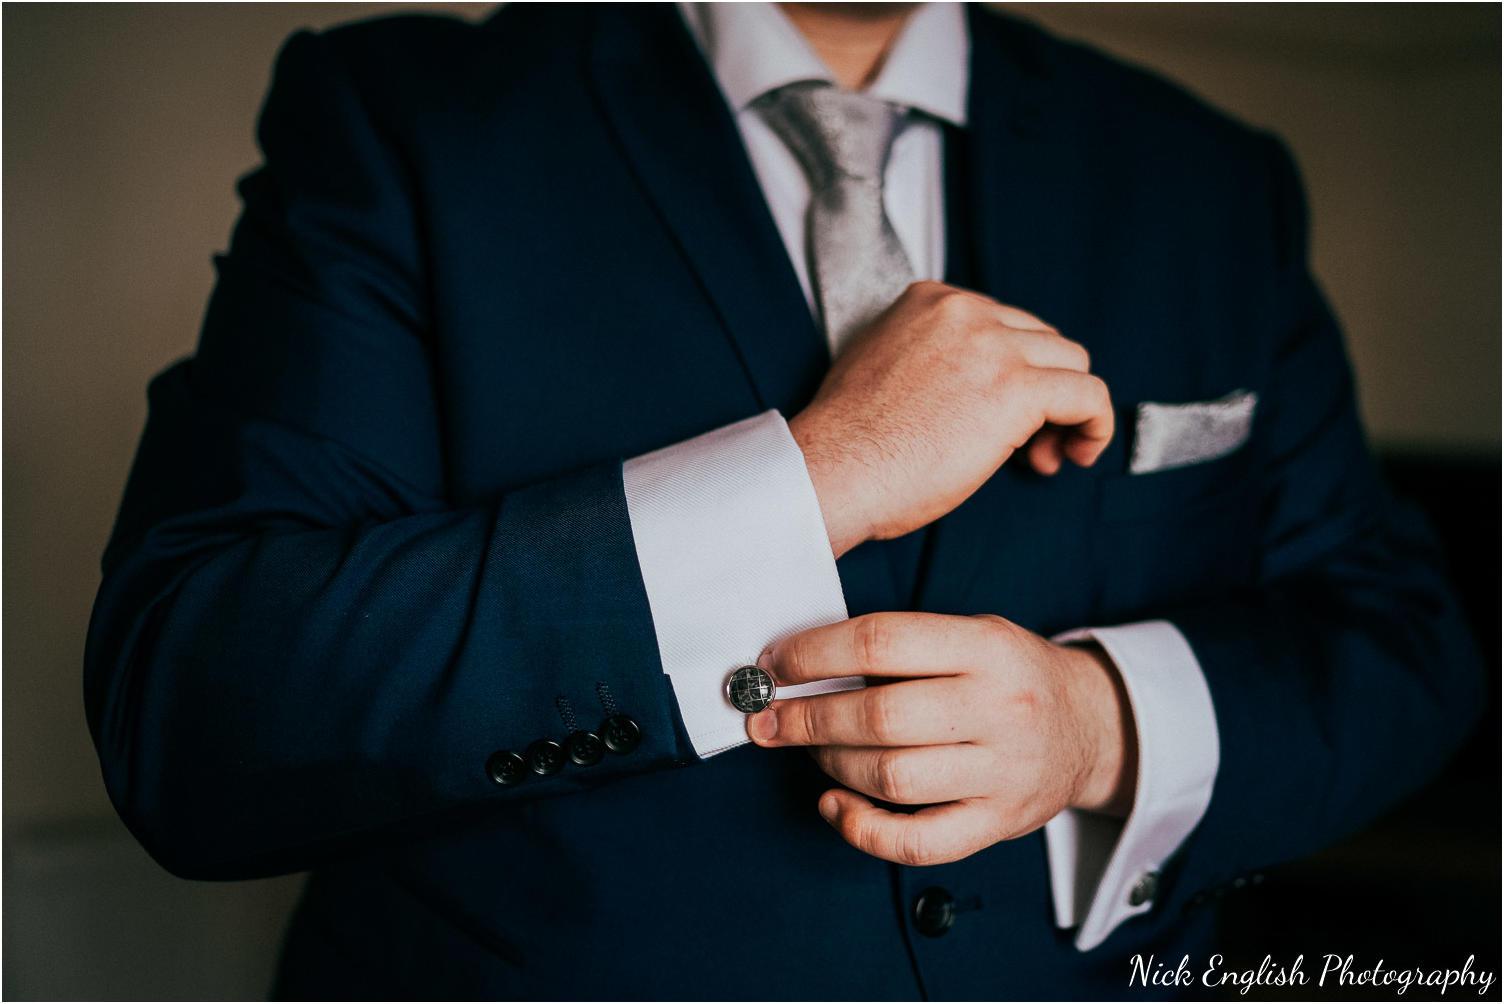 Mitton_Hall_Wedding_Photographer-6.jpg